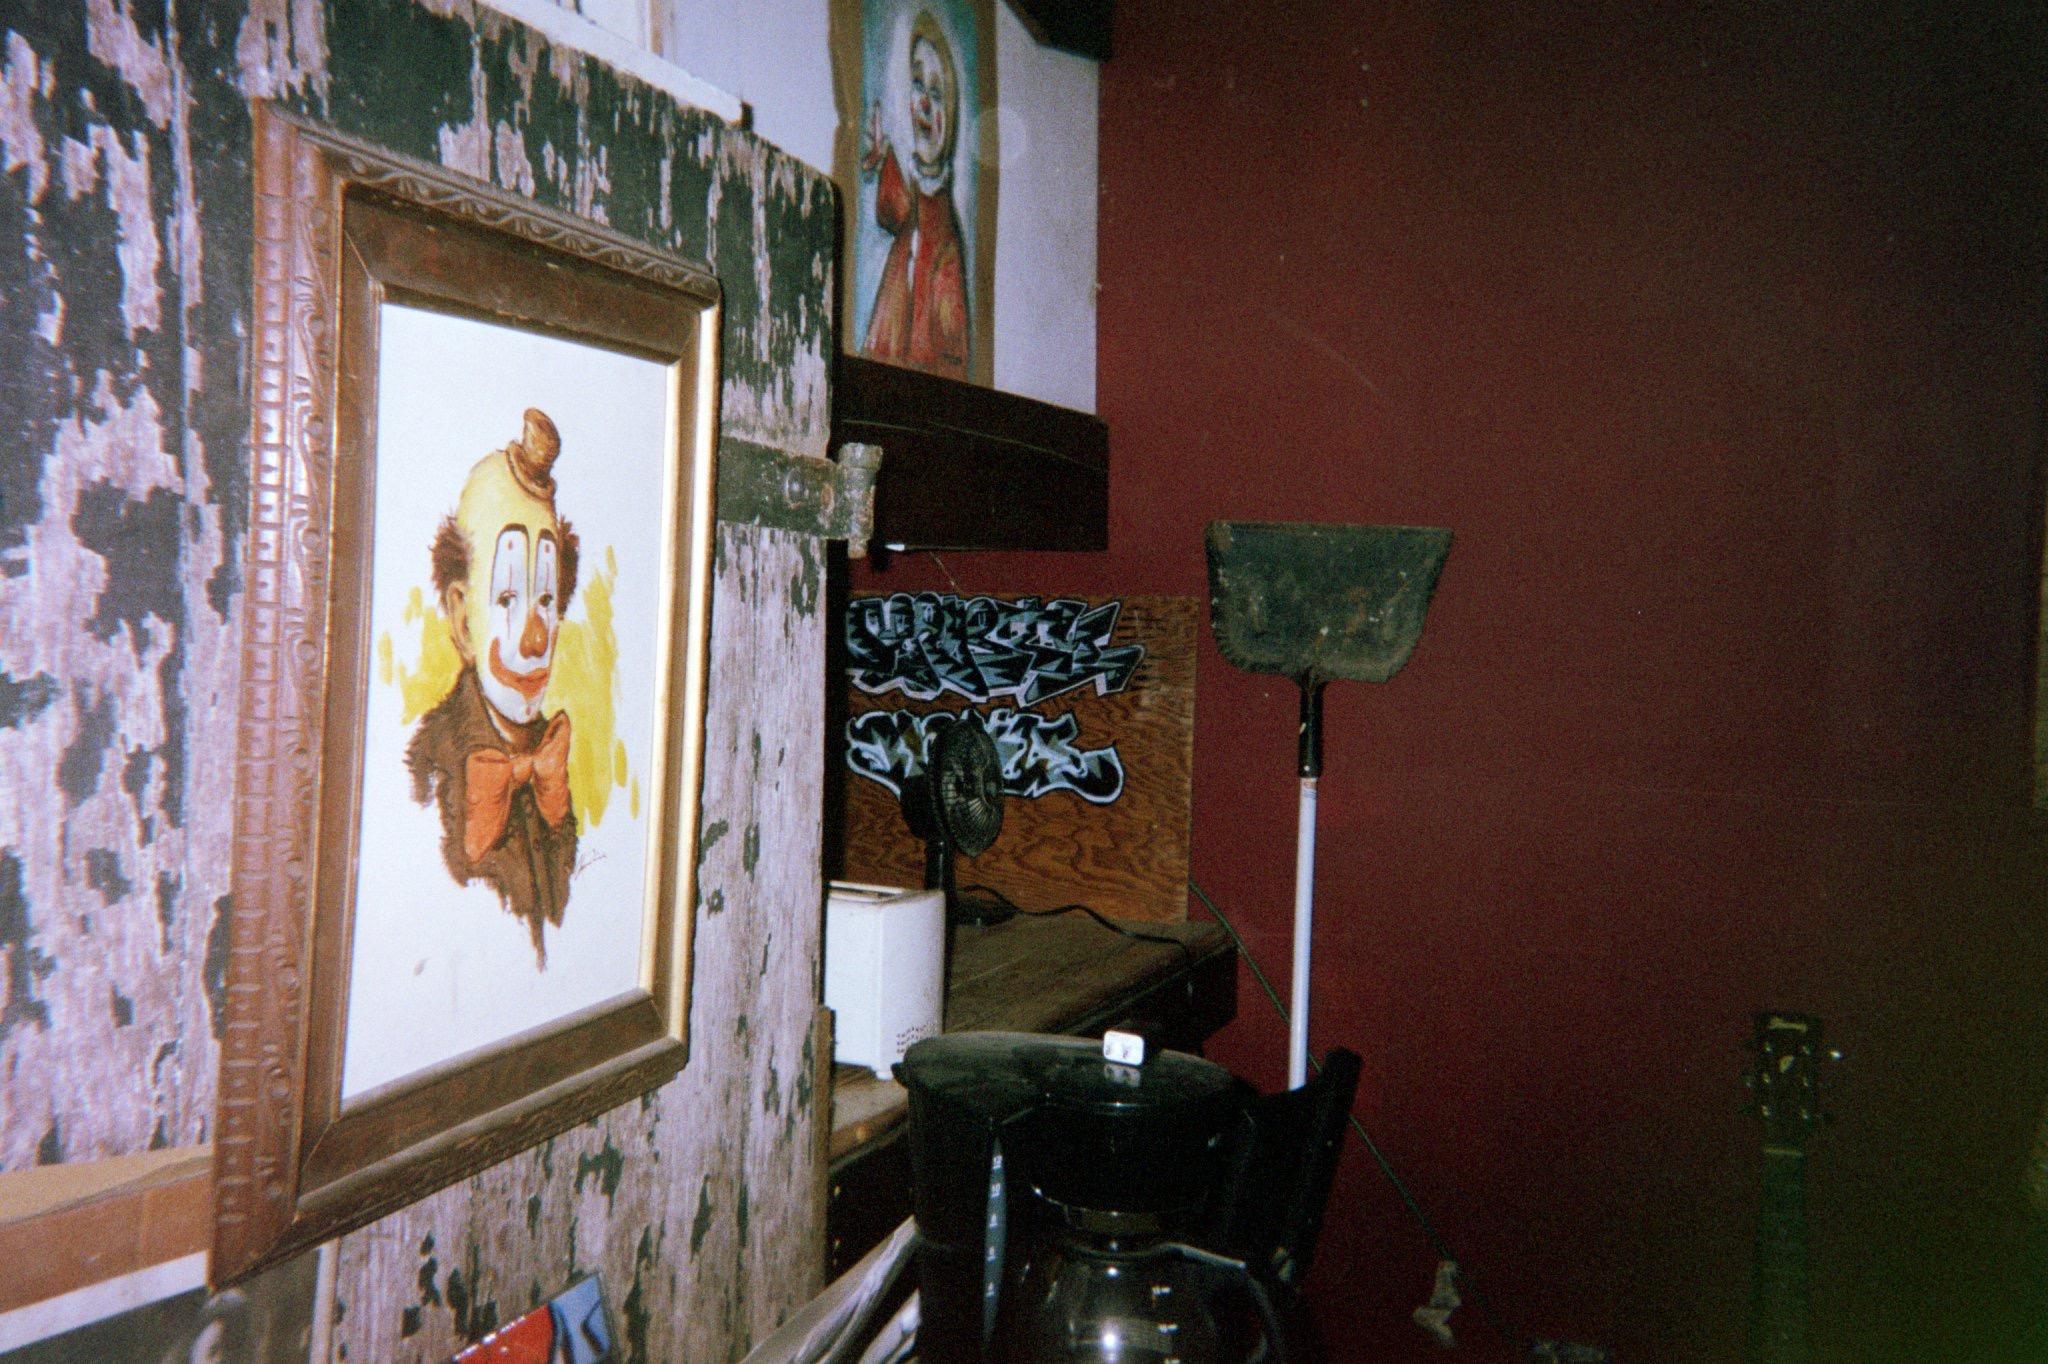 129 Gallery pt. 2